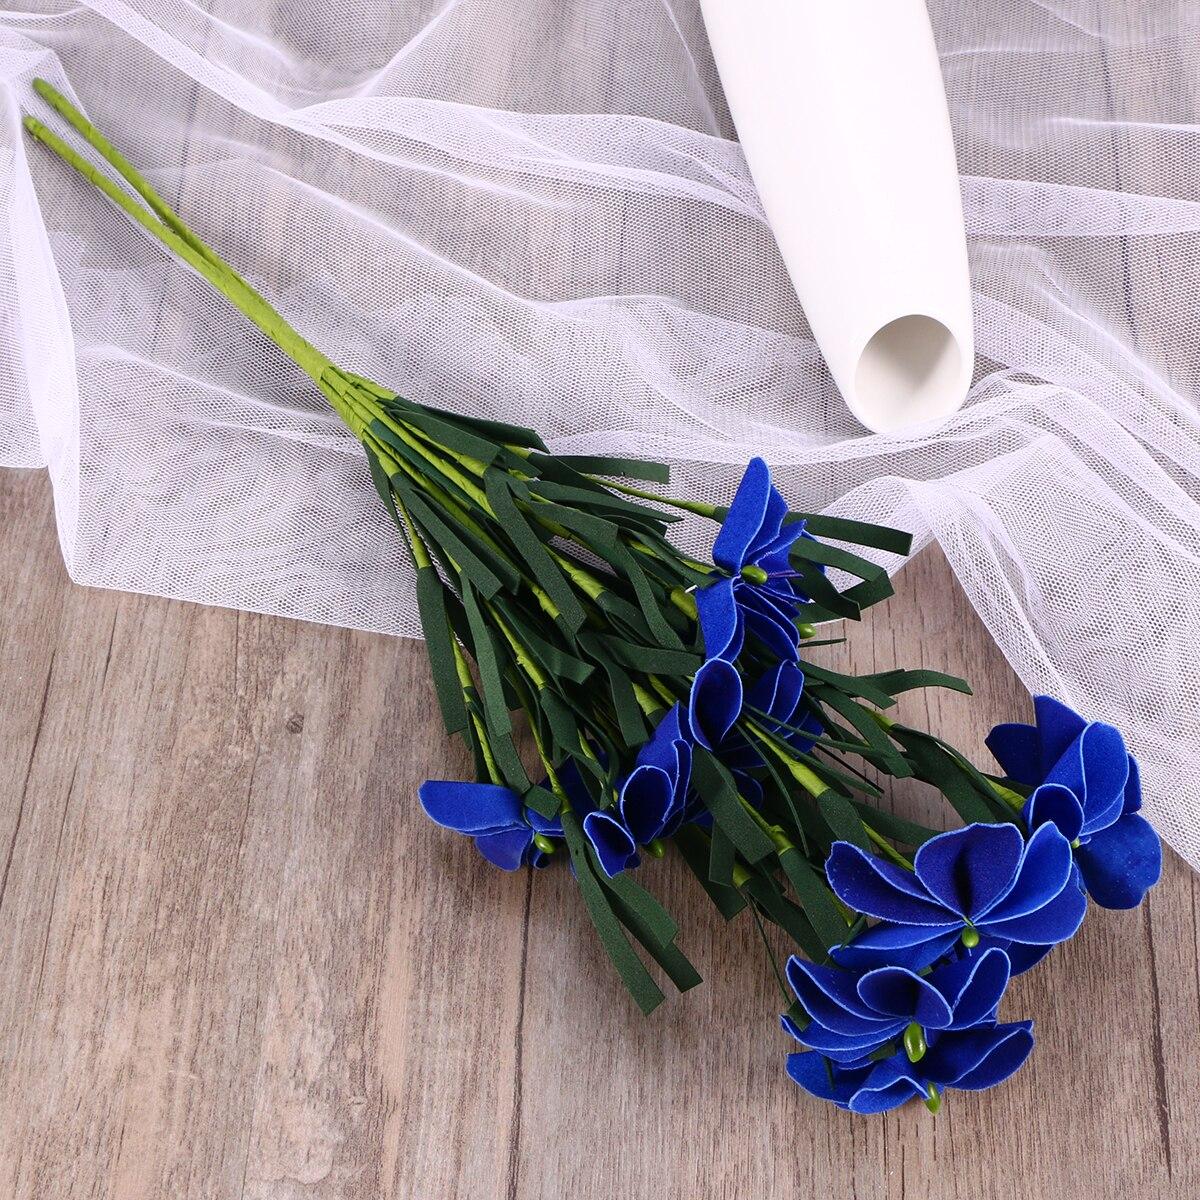 Aliexpress Buy 2pcs Artificial Flowers Fake Plastic Simulation